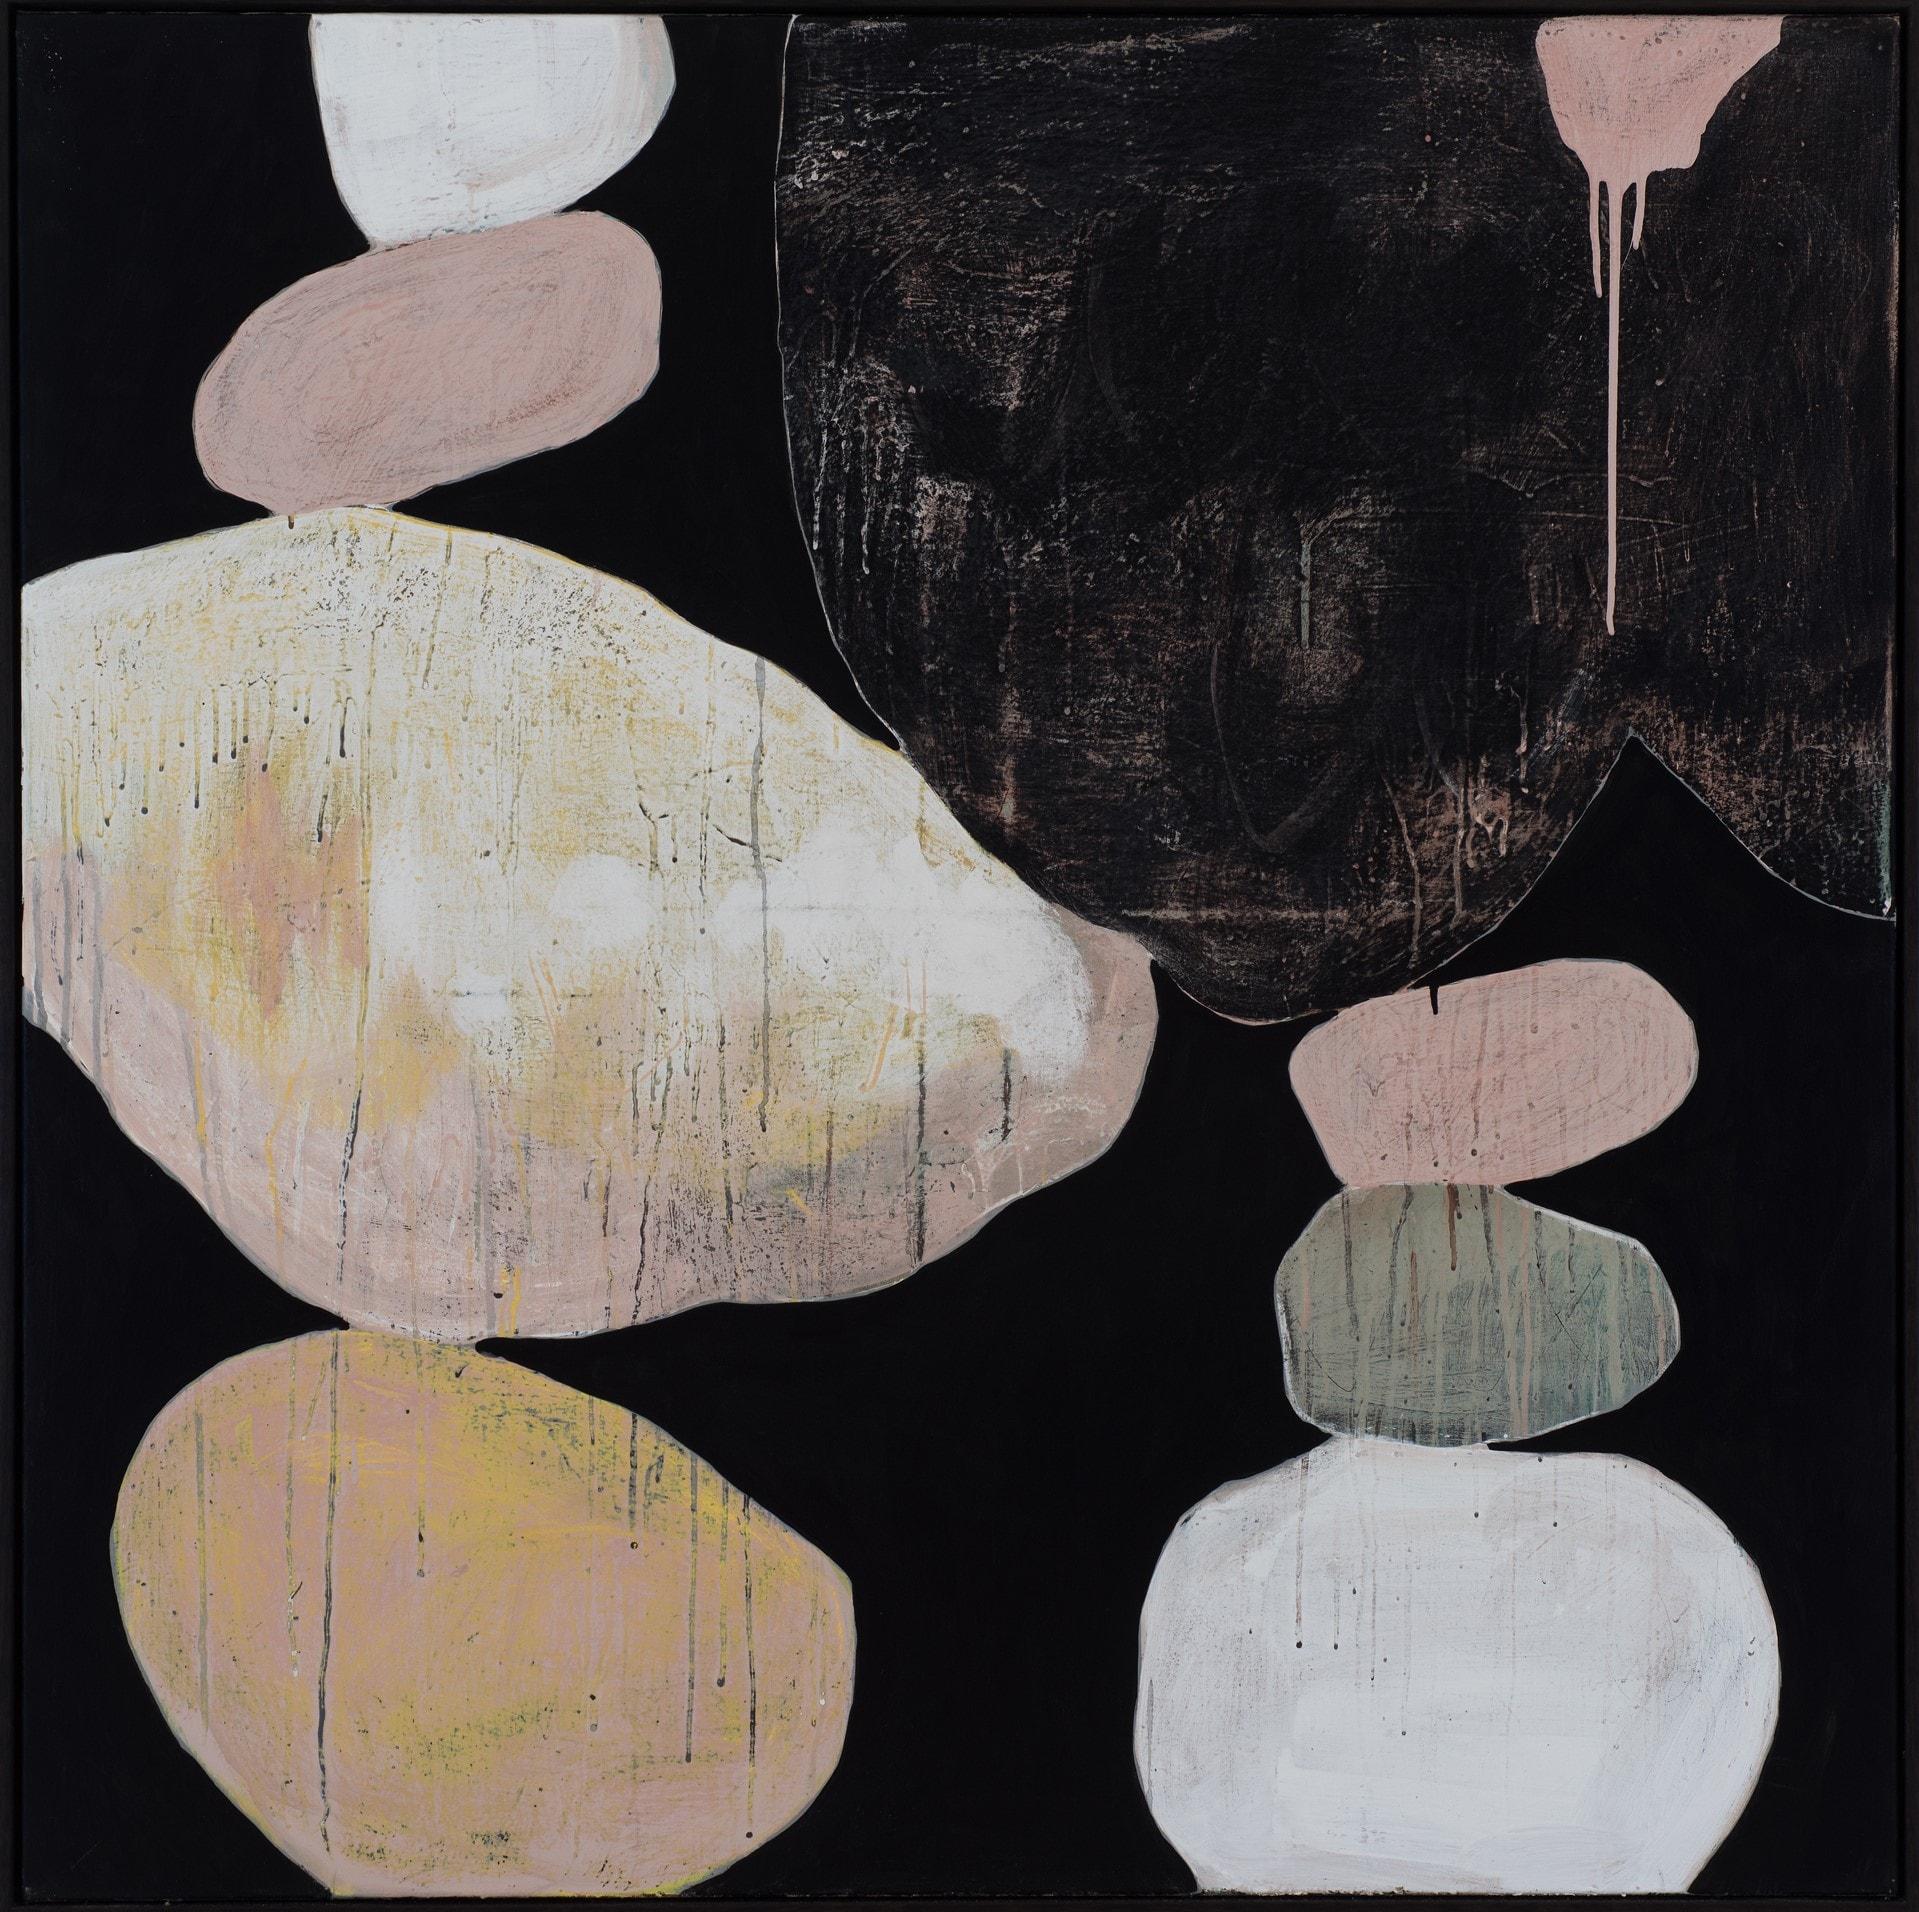 Ngaio Lenz, No. 108, 2017, mixed media on canvas, 122x122cm